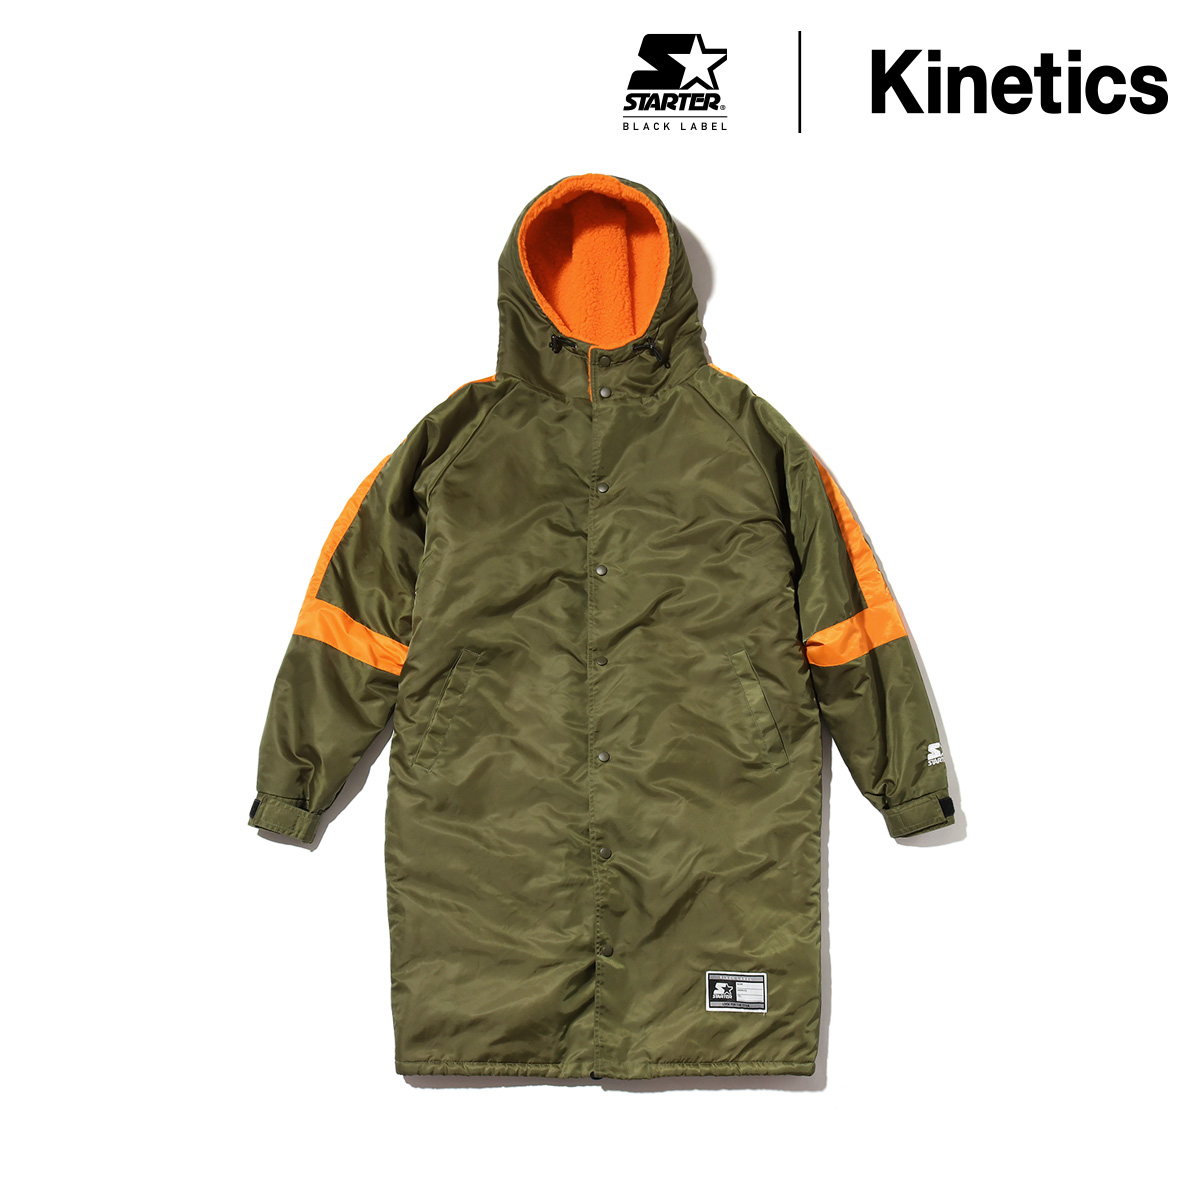 STARTER x Kinetics BENCH COAT(KHAKI/ORANG)(スターター x キネティクス ベンチコート)【メンズ】【コート】【sale0123】【30】【18FW-S】